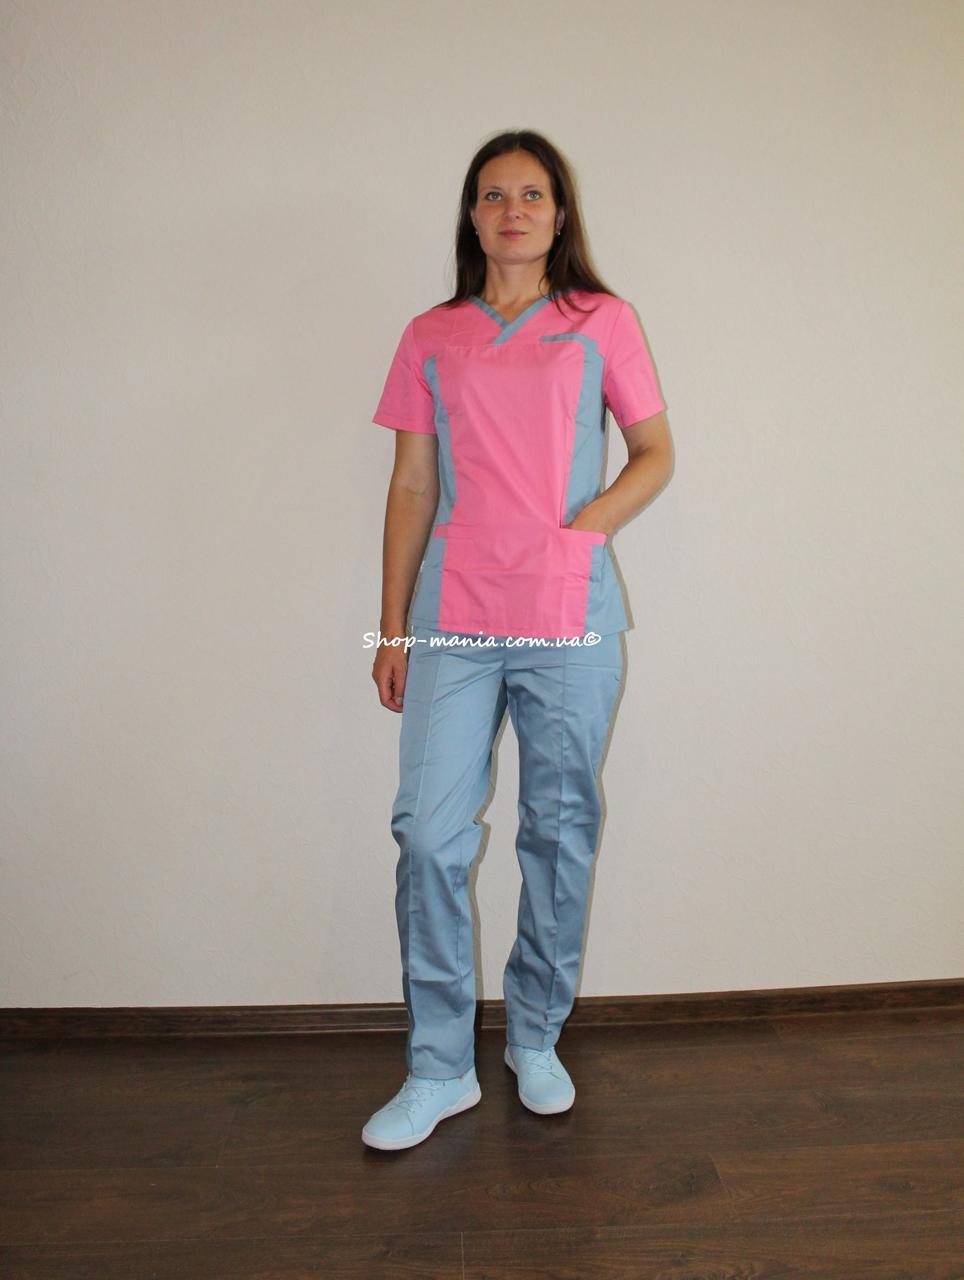 Хирургический медицинский женский костюм SM 1400-9 коттон Lilija 42-56 р (коралл-серый)